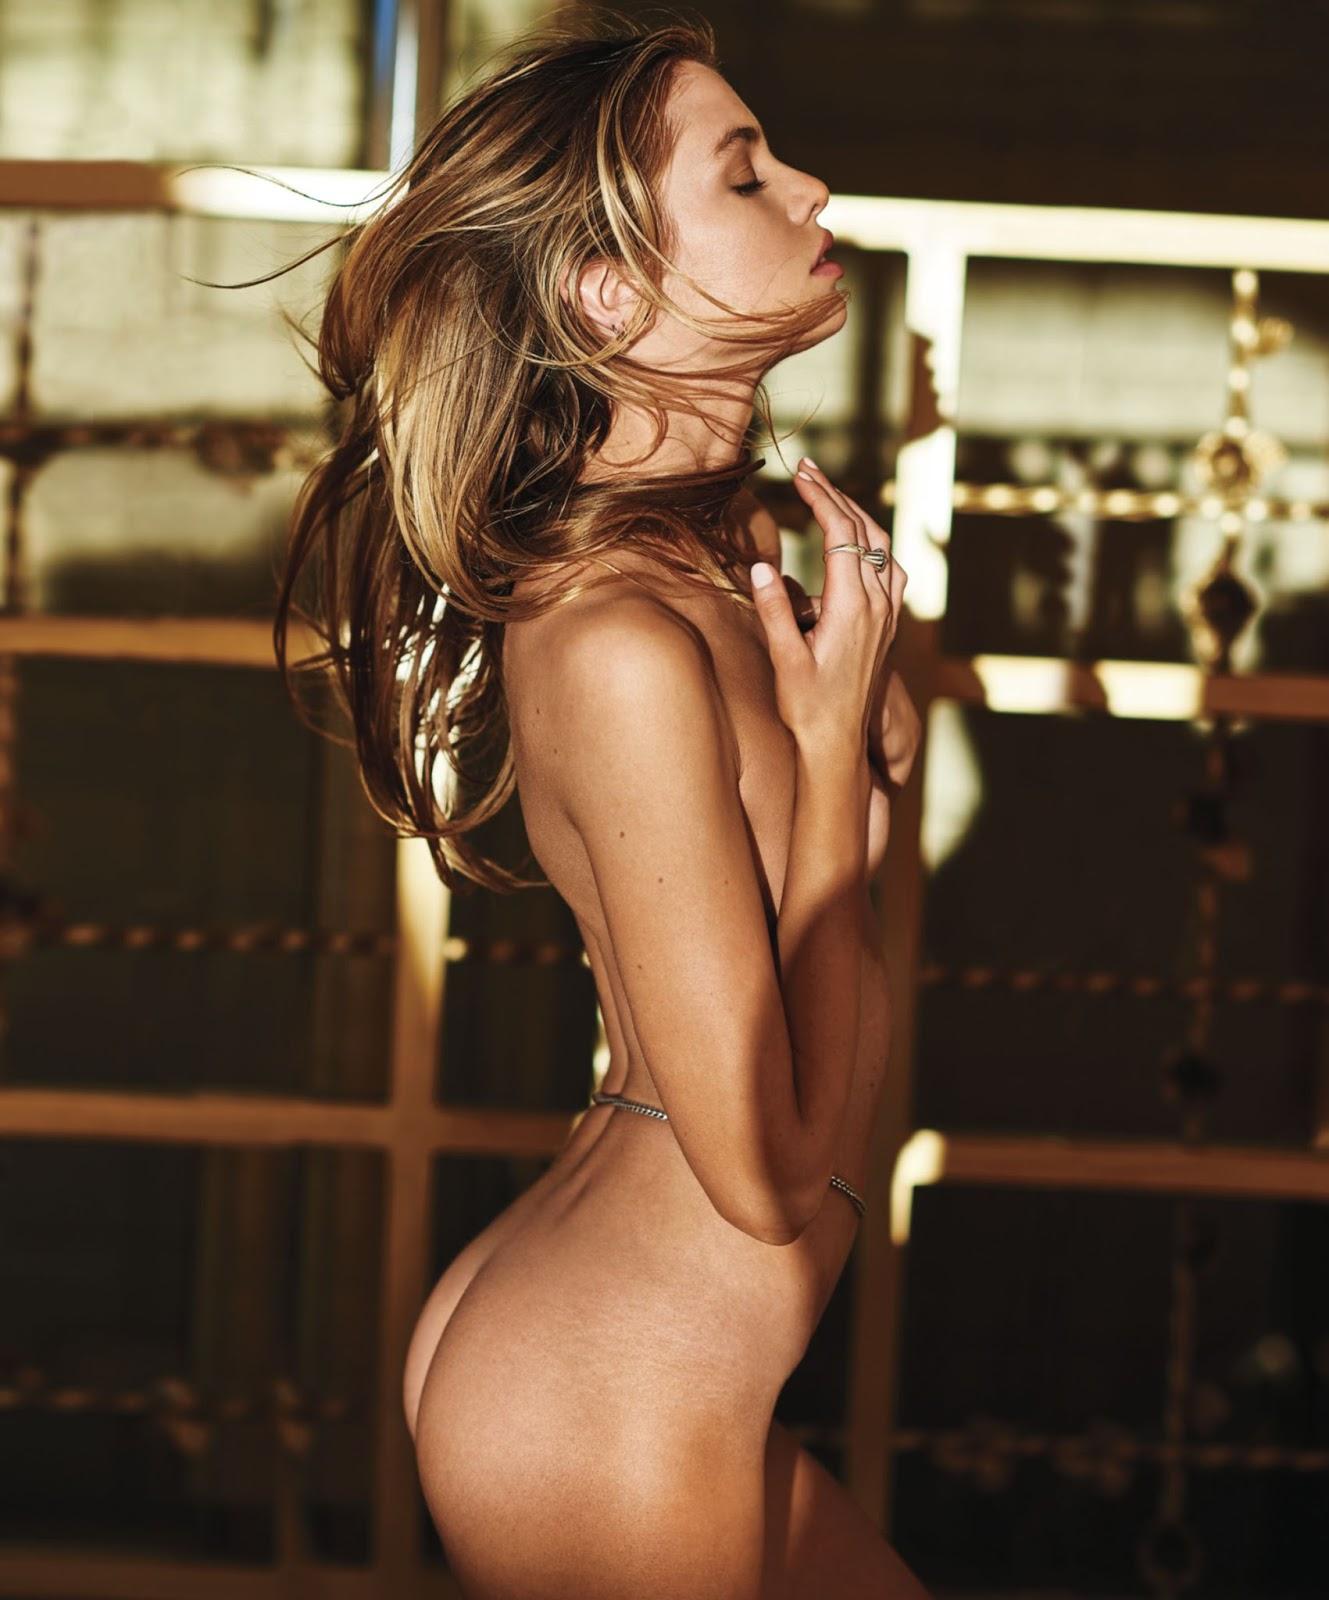 Lindsay maxwell nude the killing machine 6